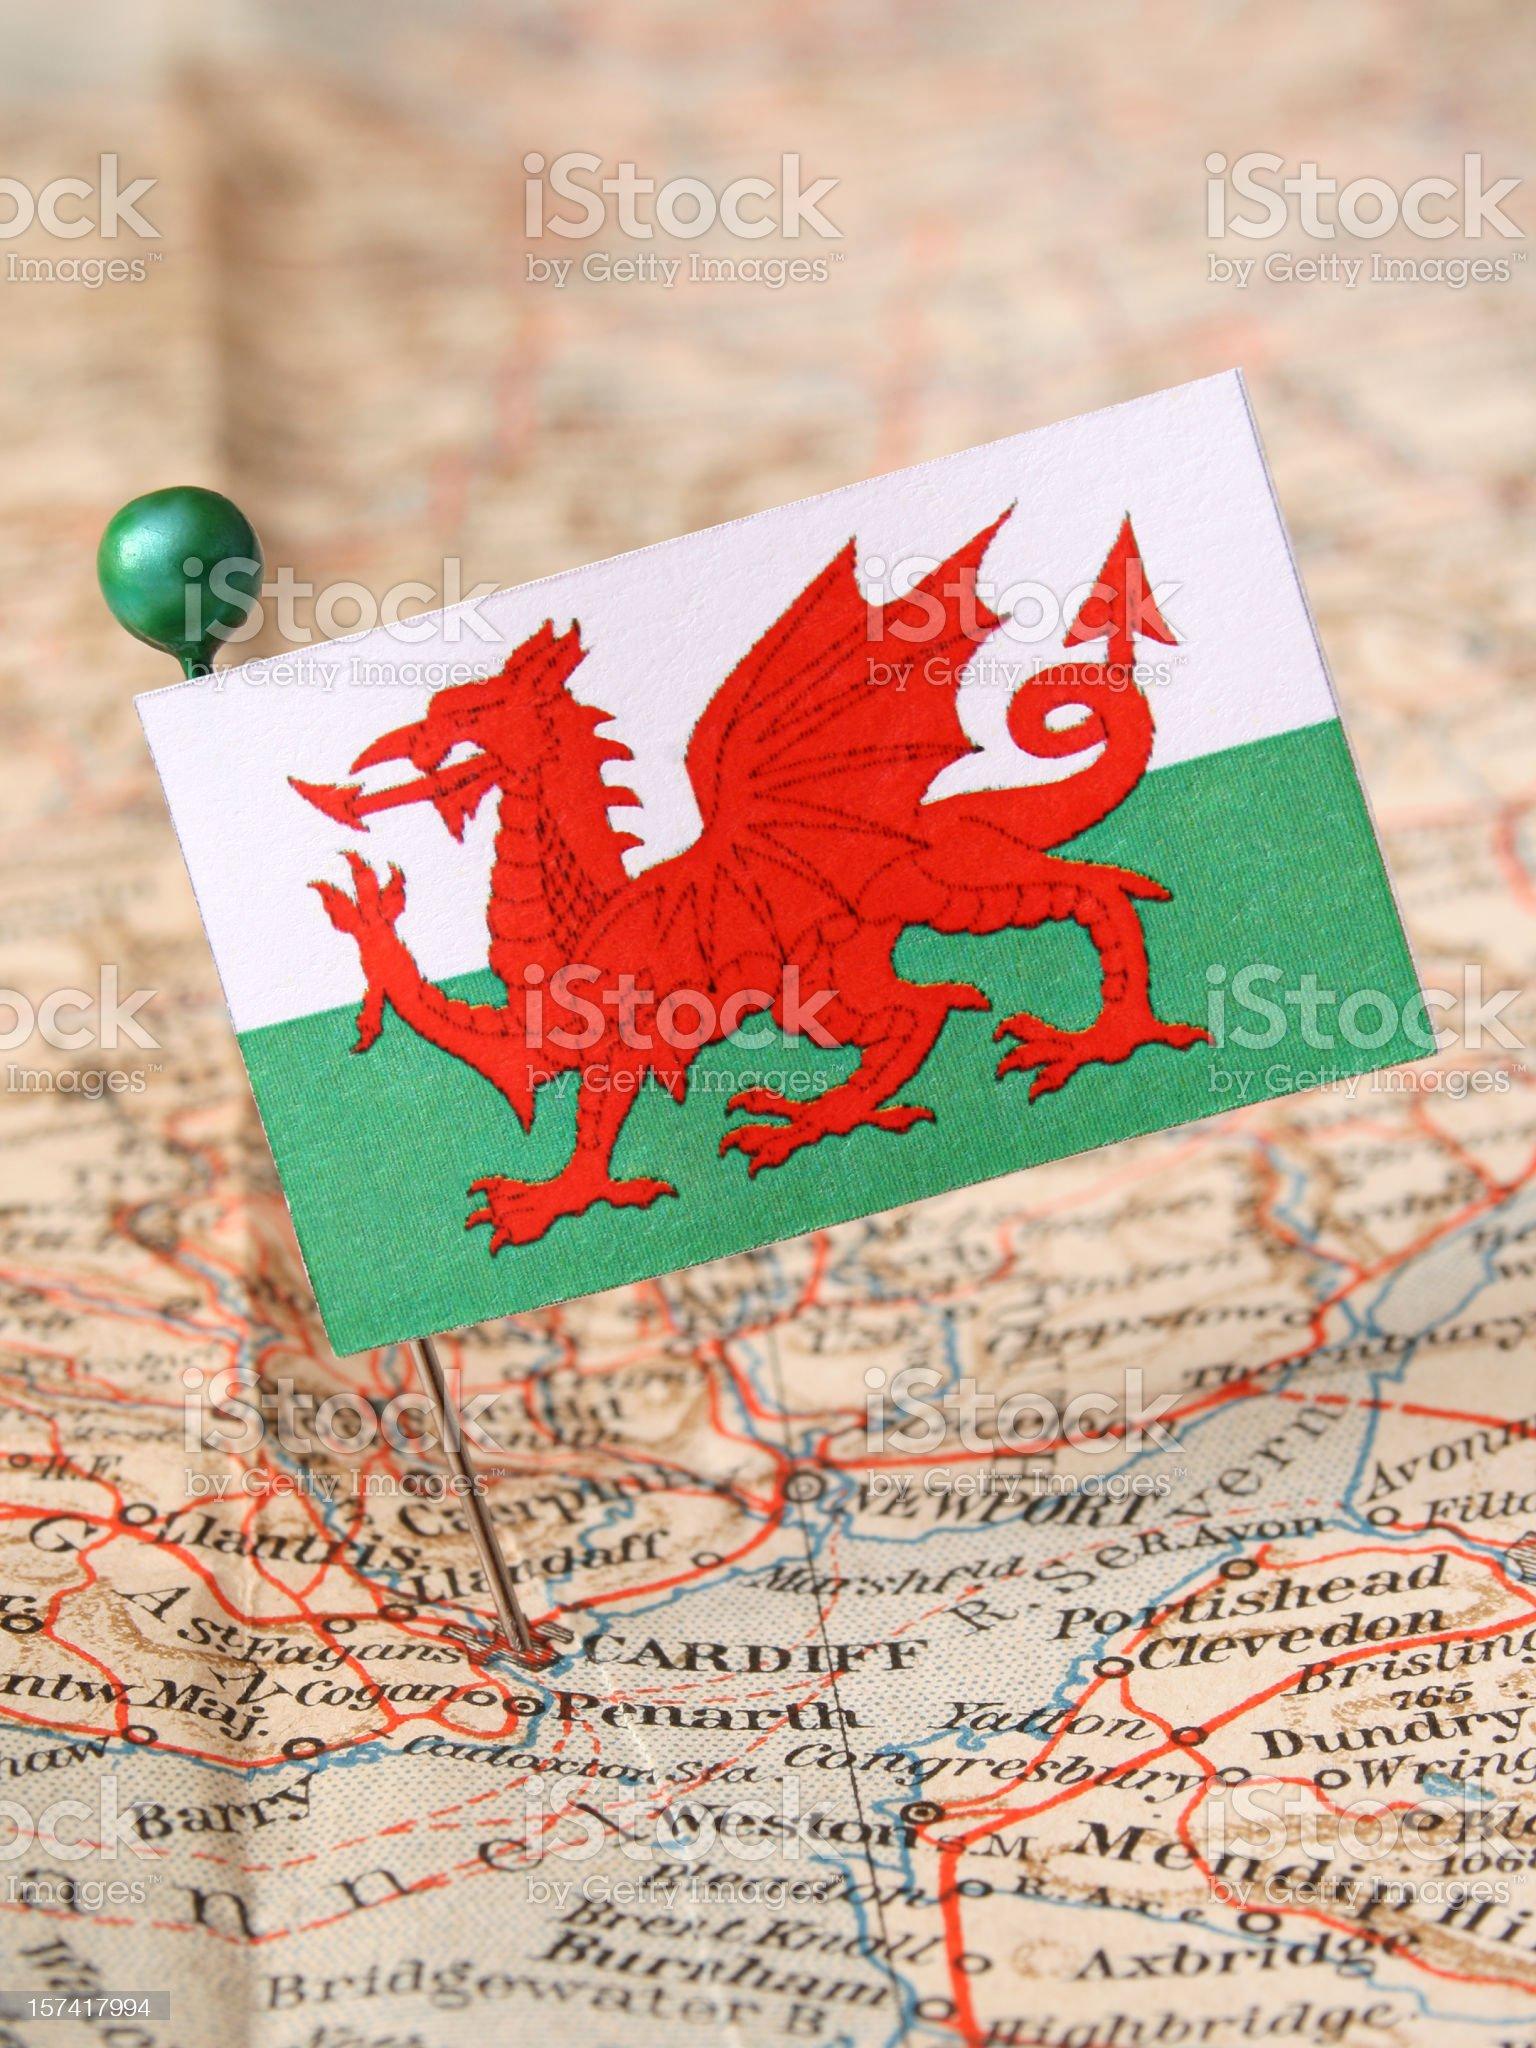 Wales royalty-free stock photo